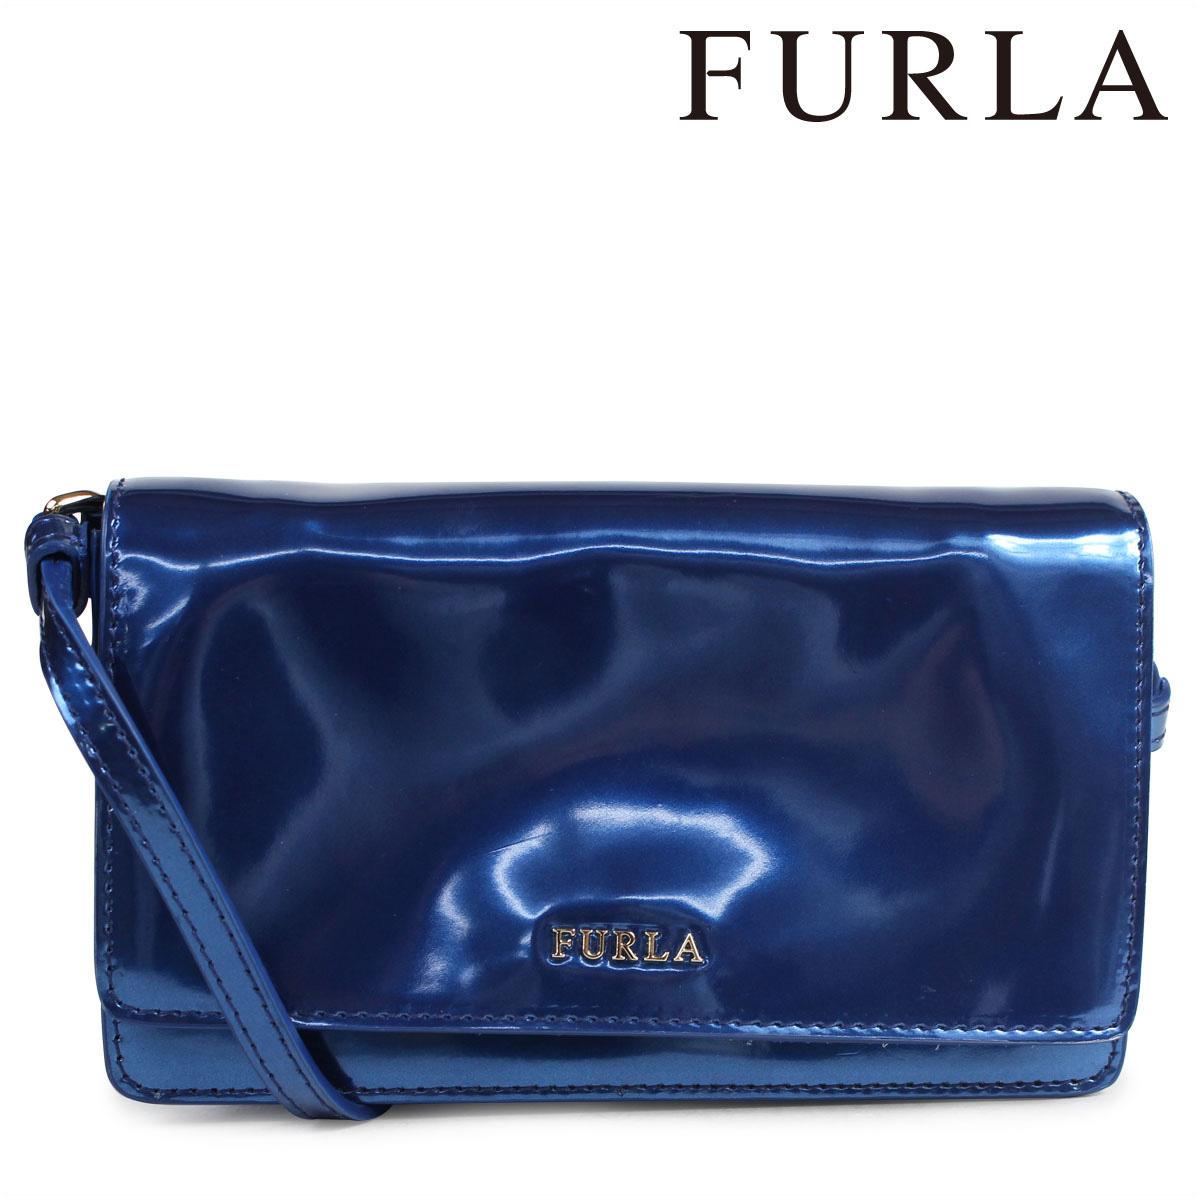 bdf992fa3ee18 FURLA フルラ バッグ ショルダー レディース ブルー ROYAL 793009  送料無料   対応  フルラ FURLA ショルダーバッグ